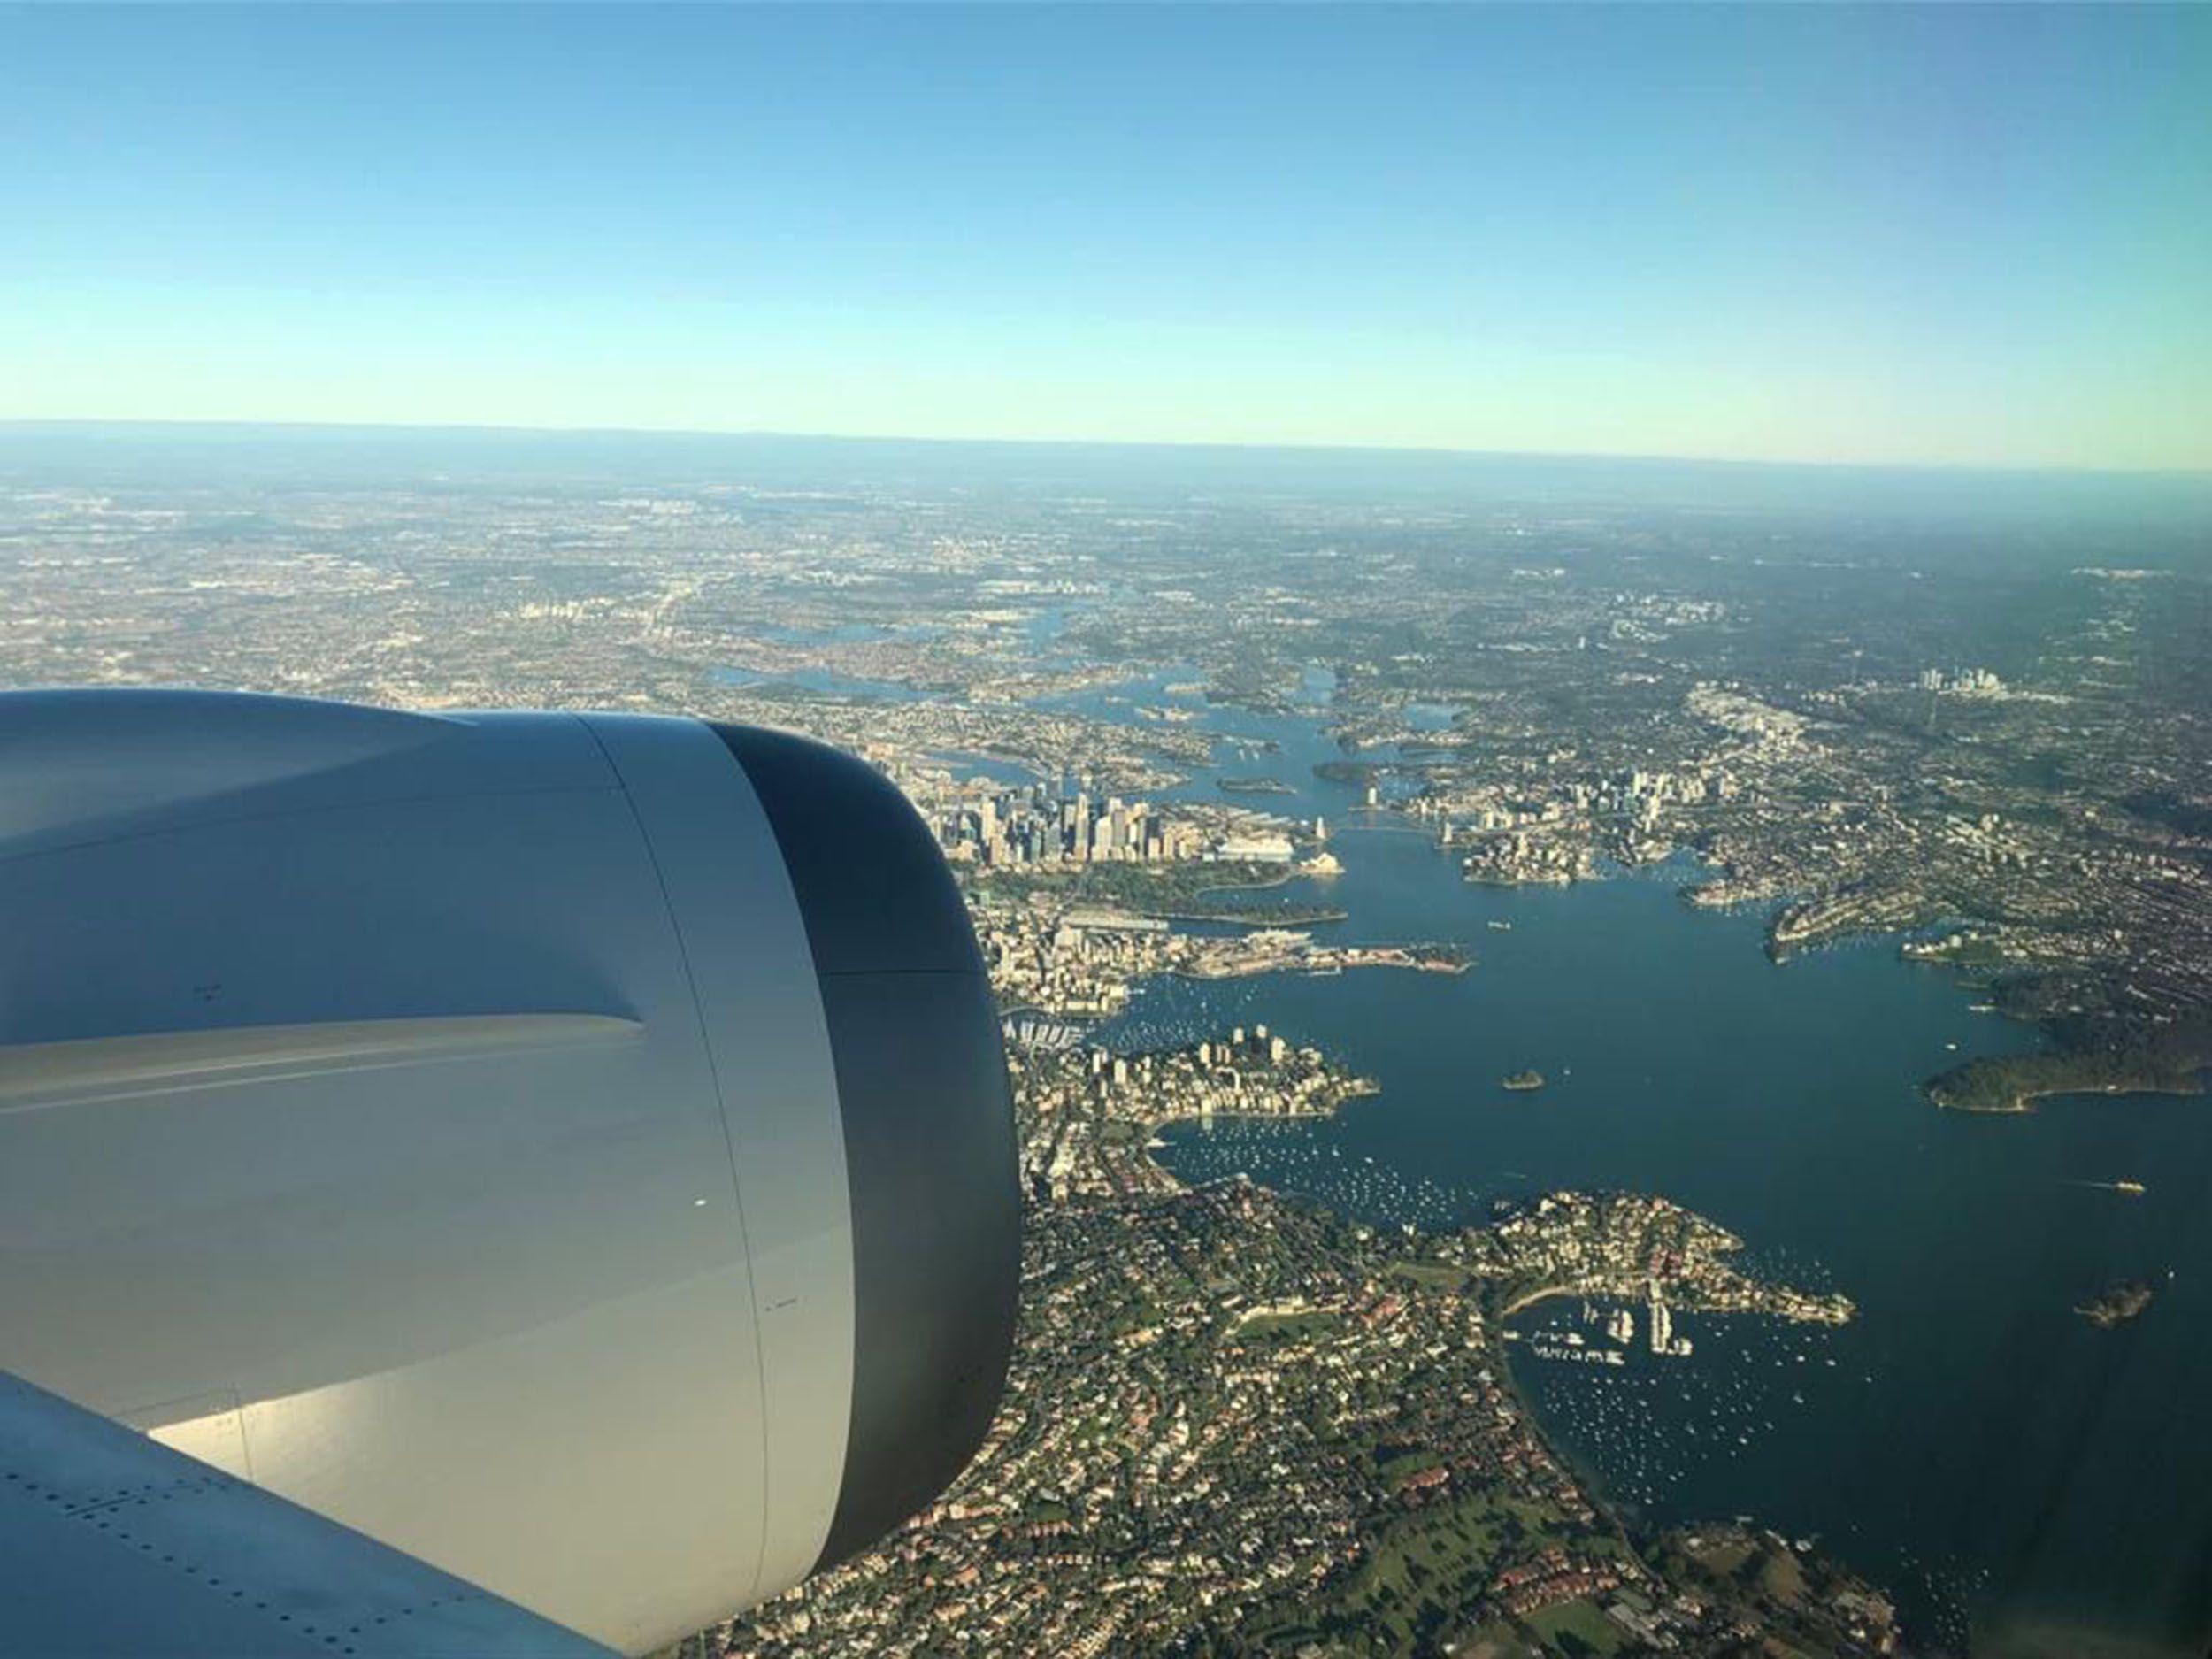 Avião da Qantas sobrevoa Sydney. Foto: Angus Whitley/Bloomberg